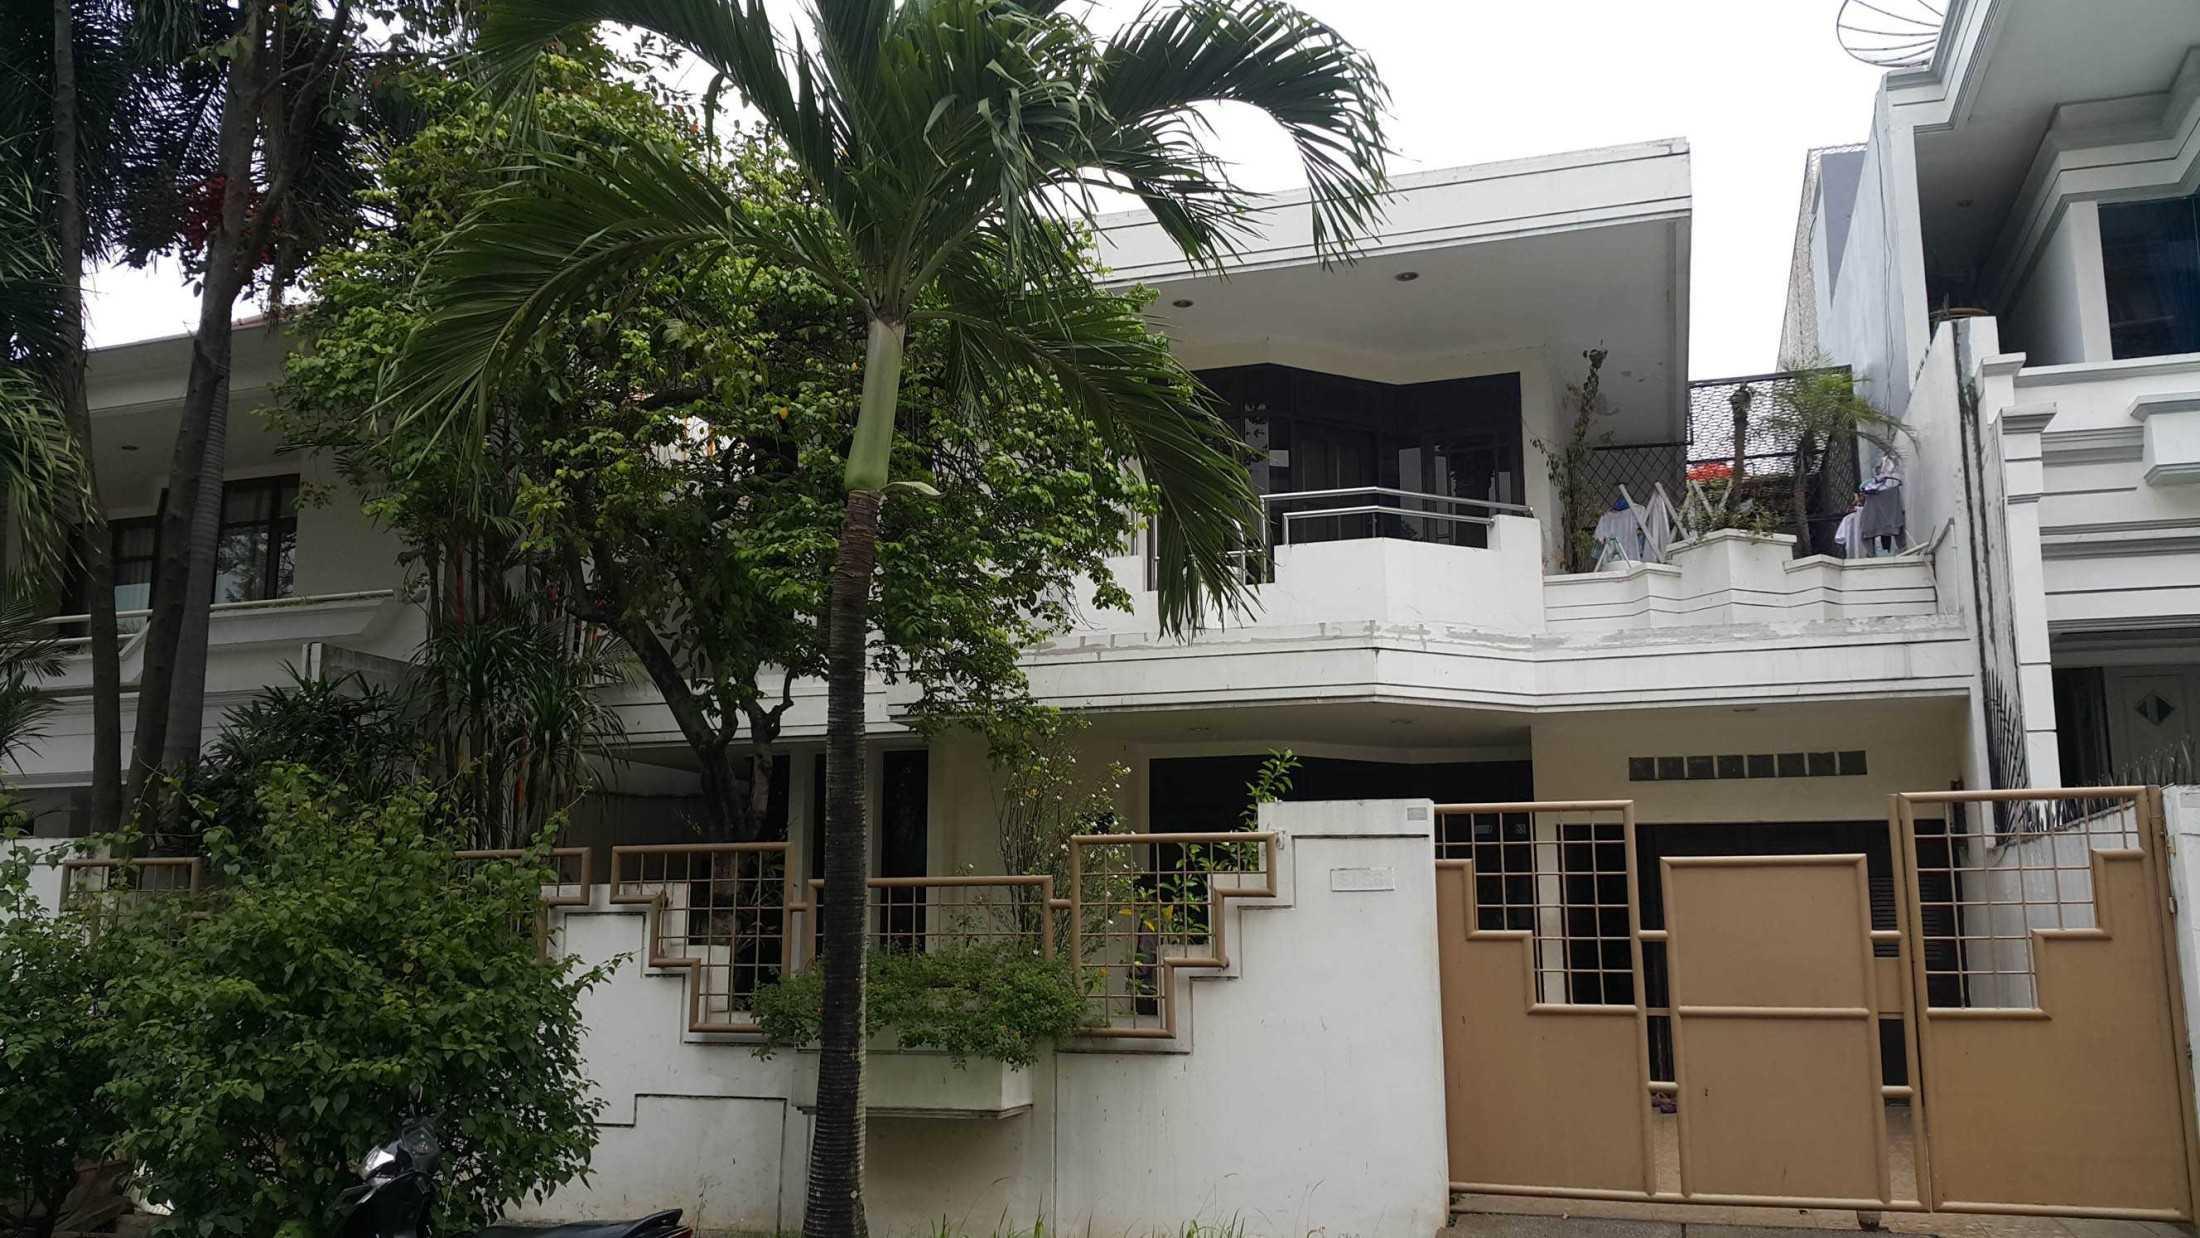 Kala Casa Studio Tkb House Jakarta, Daerah Khusus Ibukota Jakarta, Indonesia Jakarta, Daerah Khusus Ibukota Jakarta, Indonesia Kala-Casa-Studio-Tkb-House Minimalist 107759